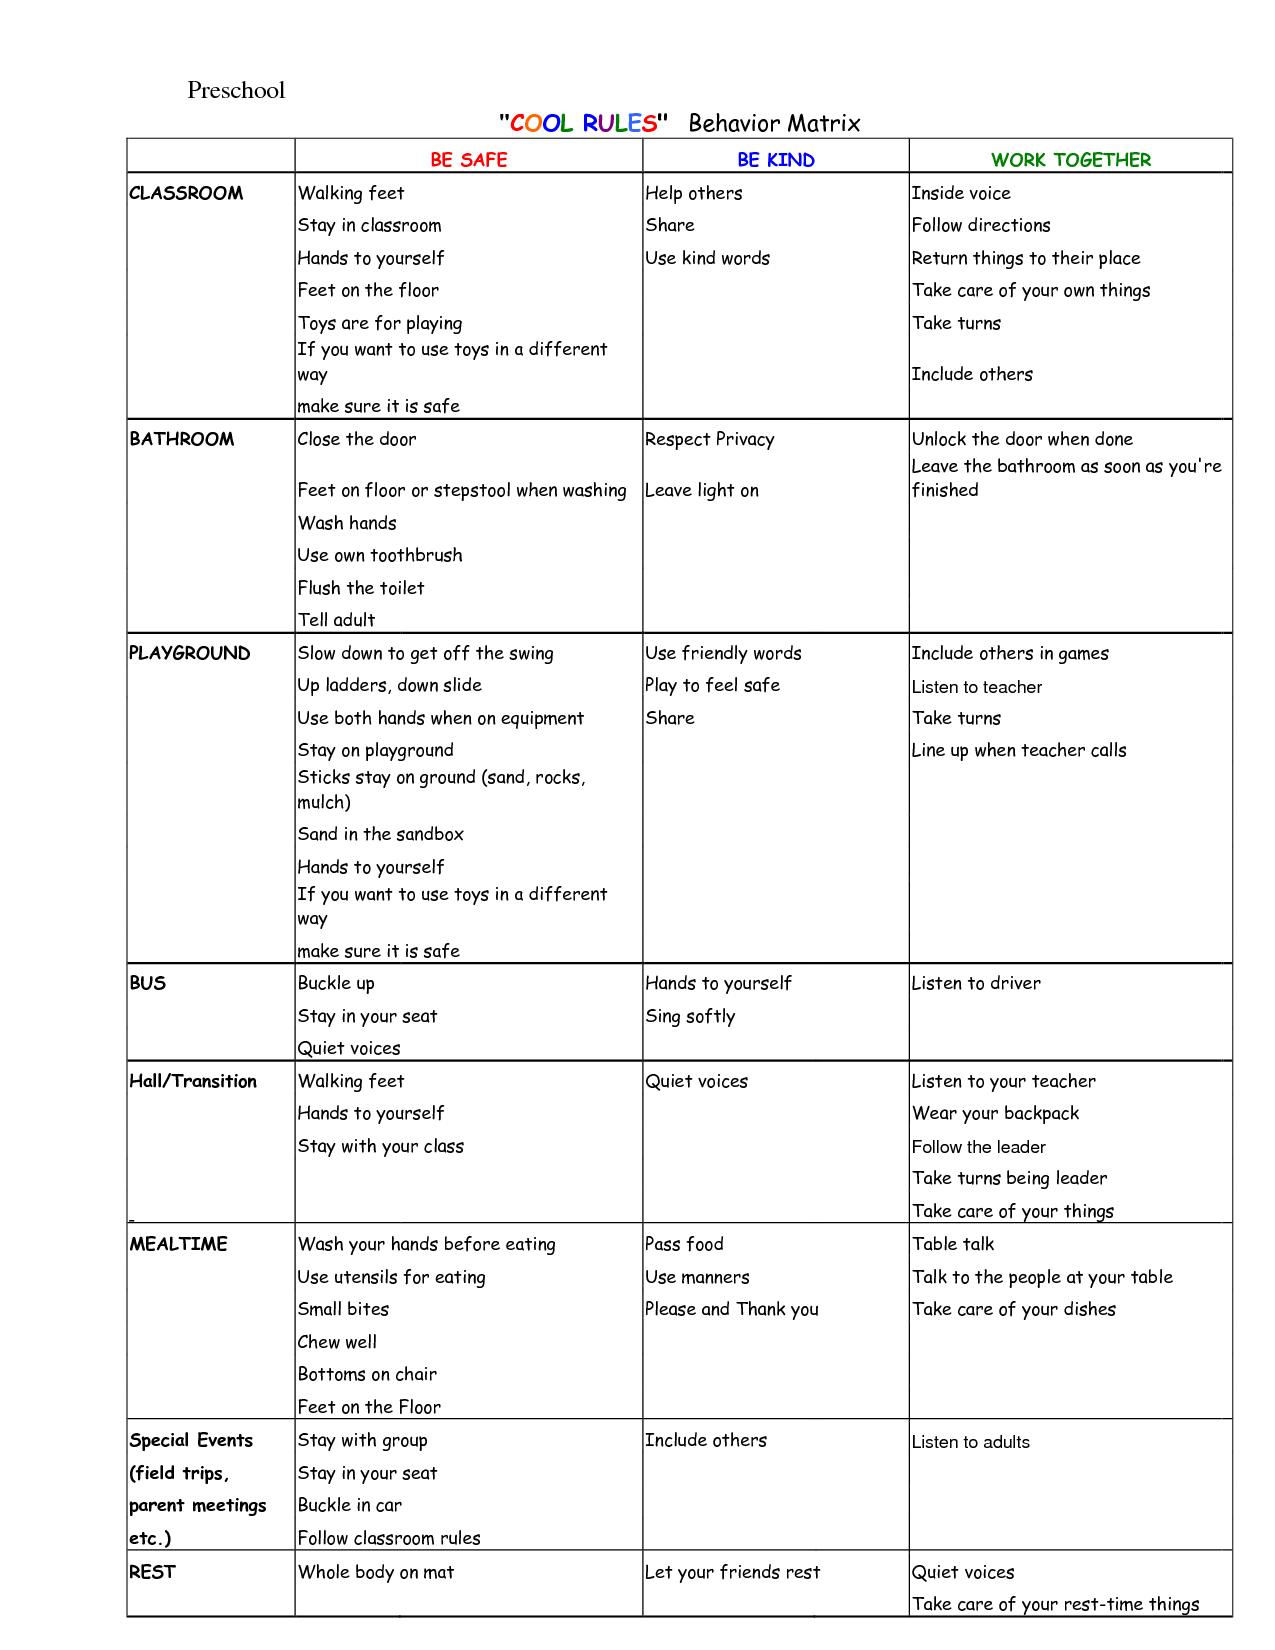 Preschool pbis cool rules behavior matrix pwpbis